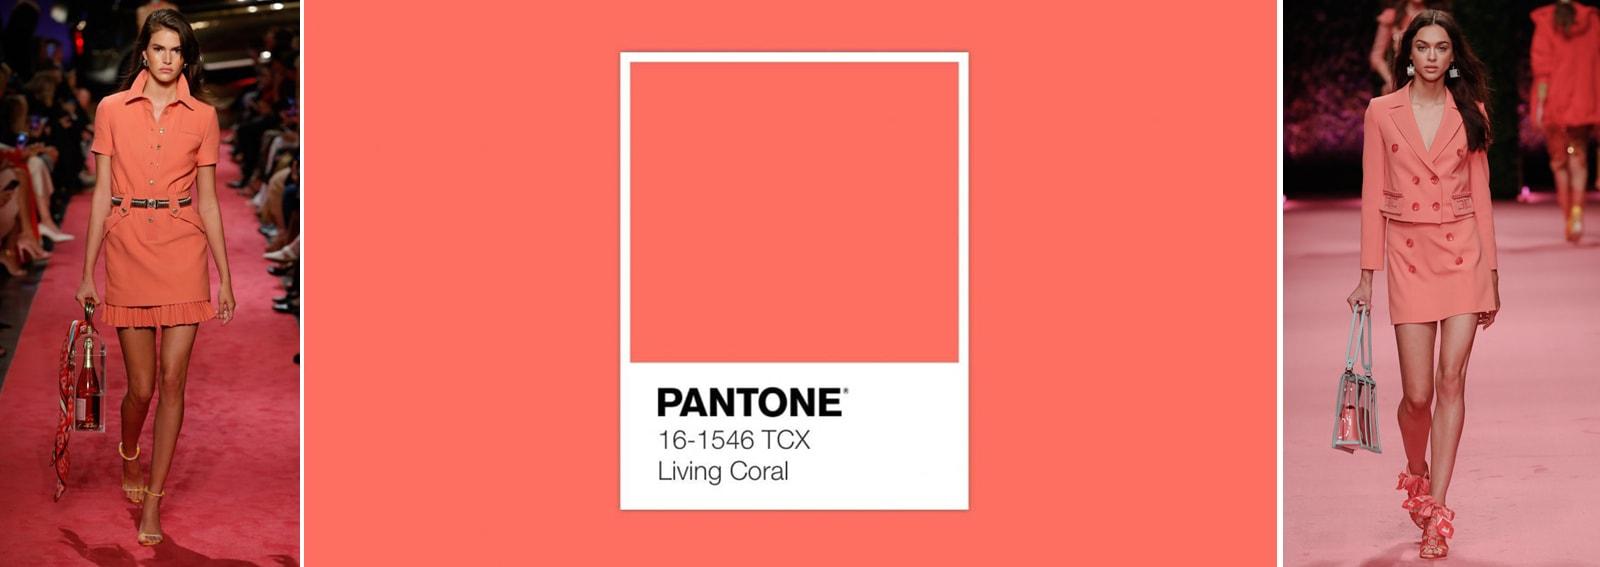 pantone-2019-DESK